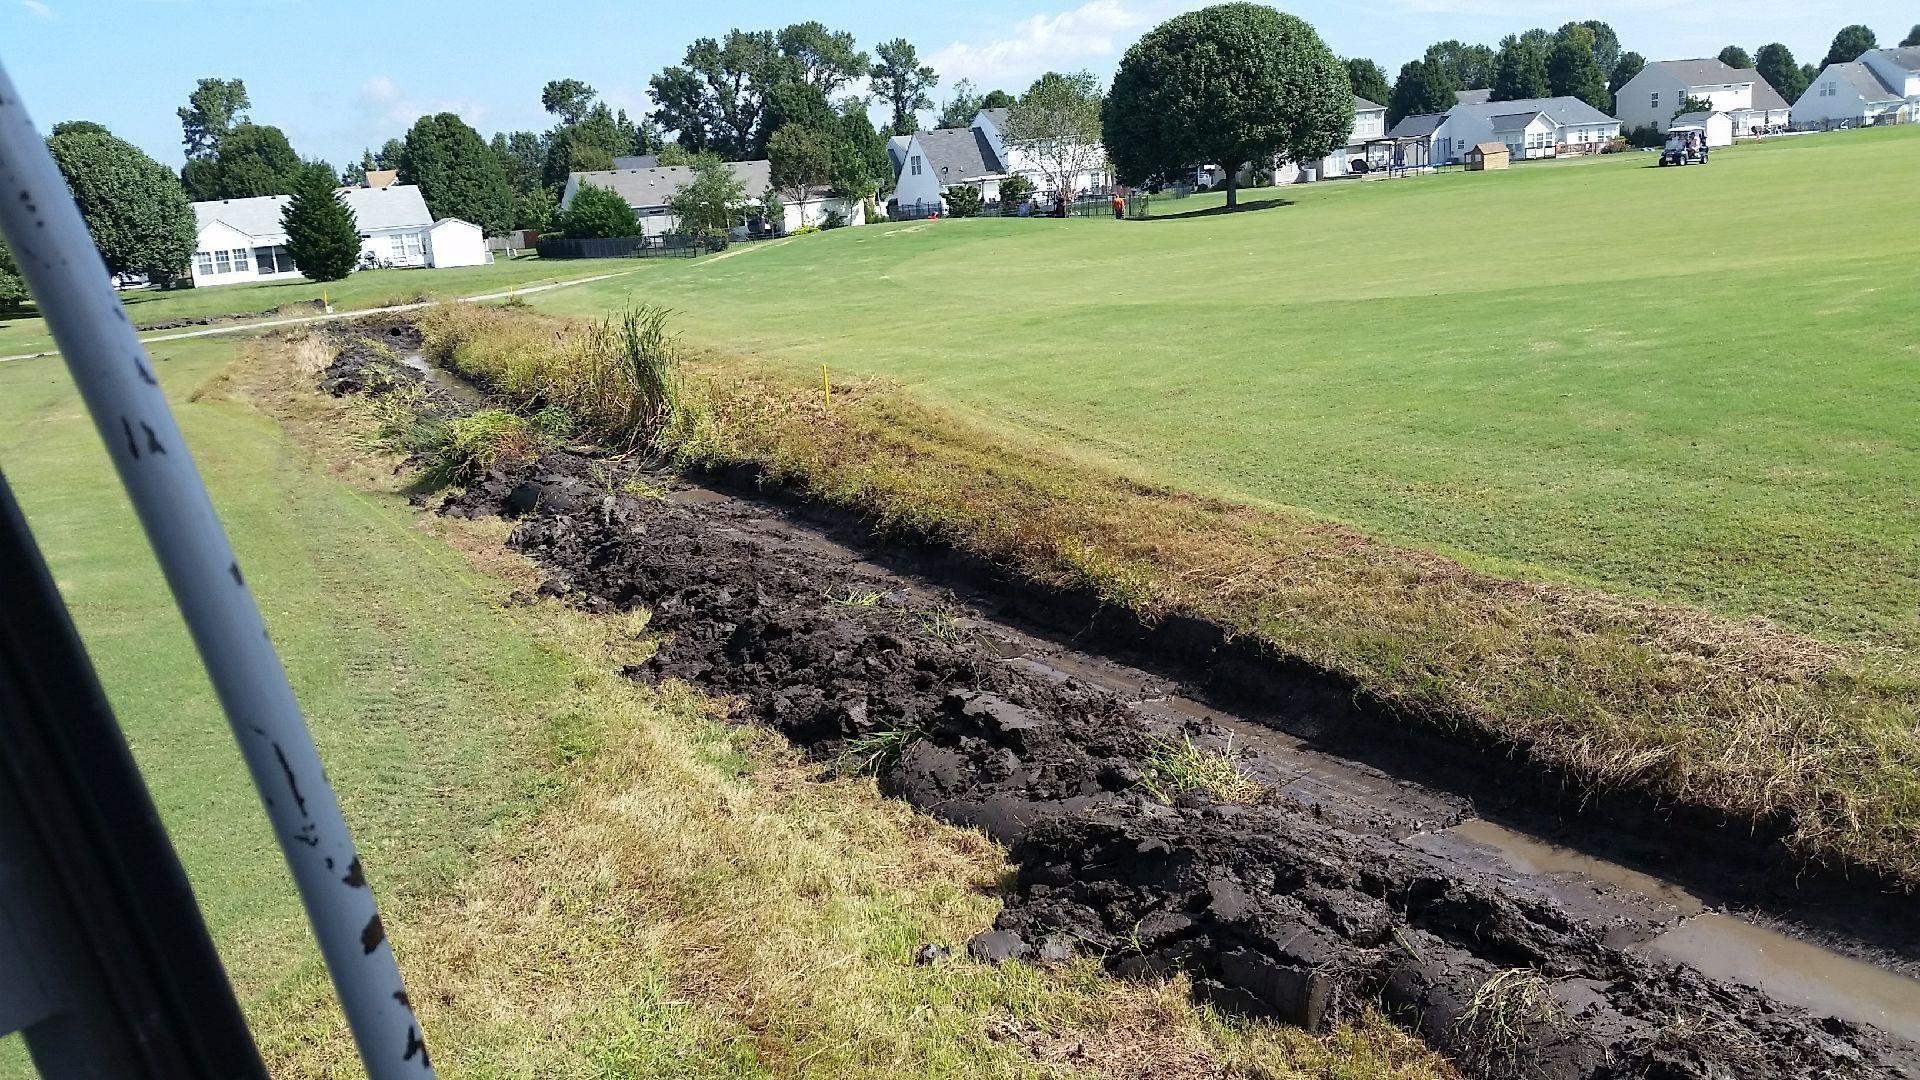 Ditch Under Construction